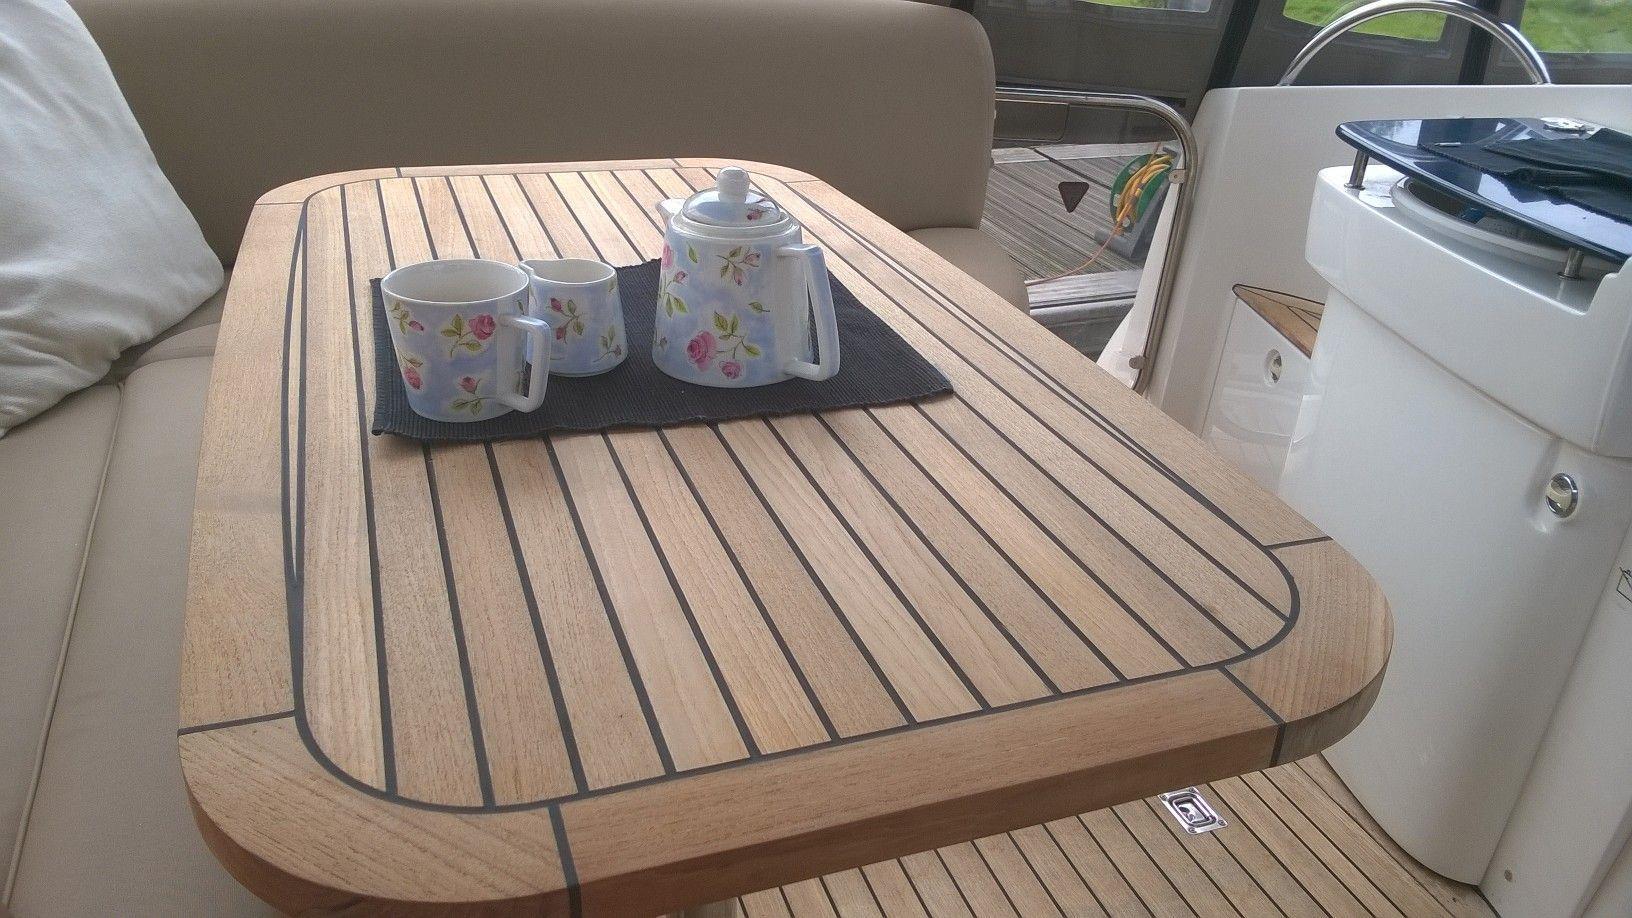 Nautic Star Sealine S38 Sc38 Teak Boat Table Marine Teak